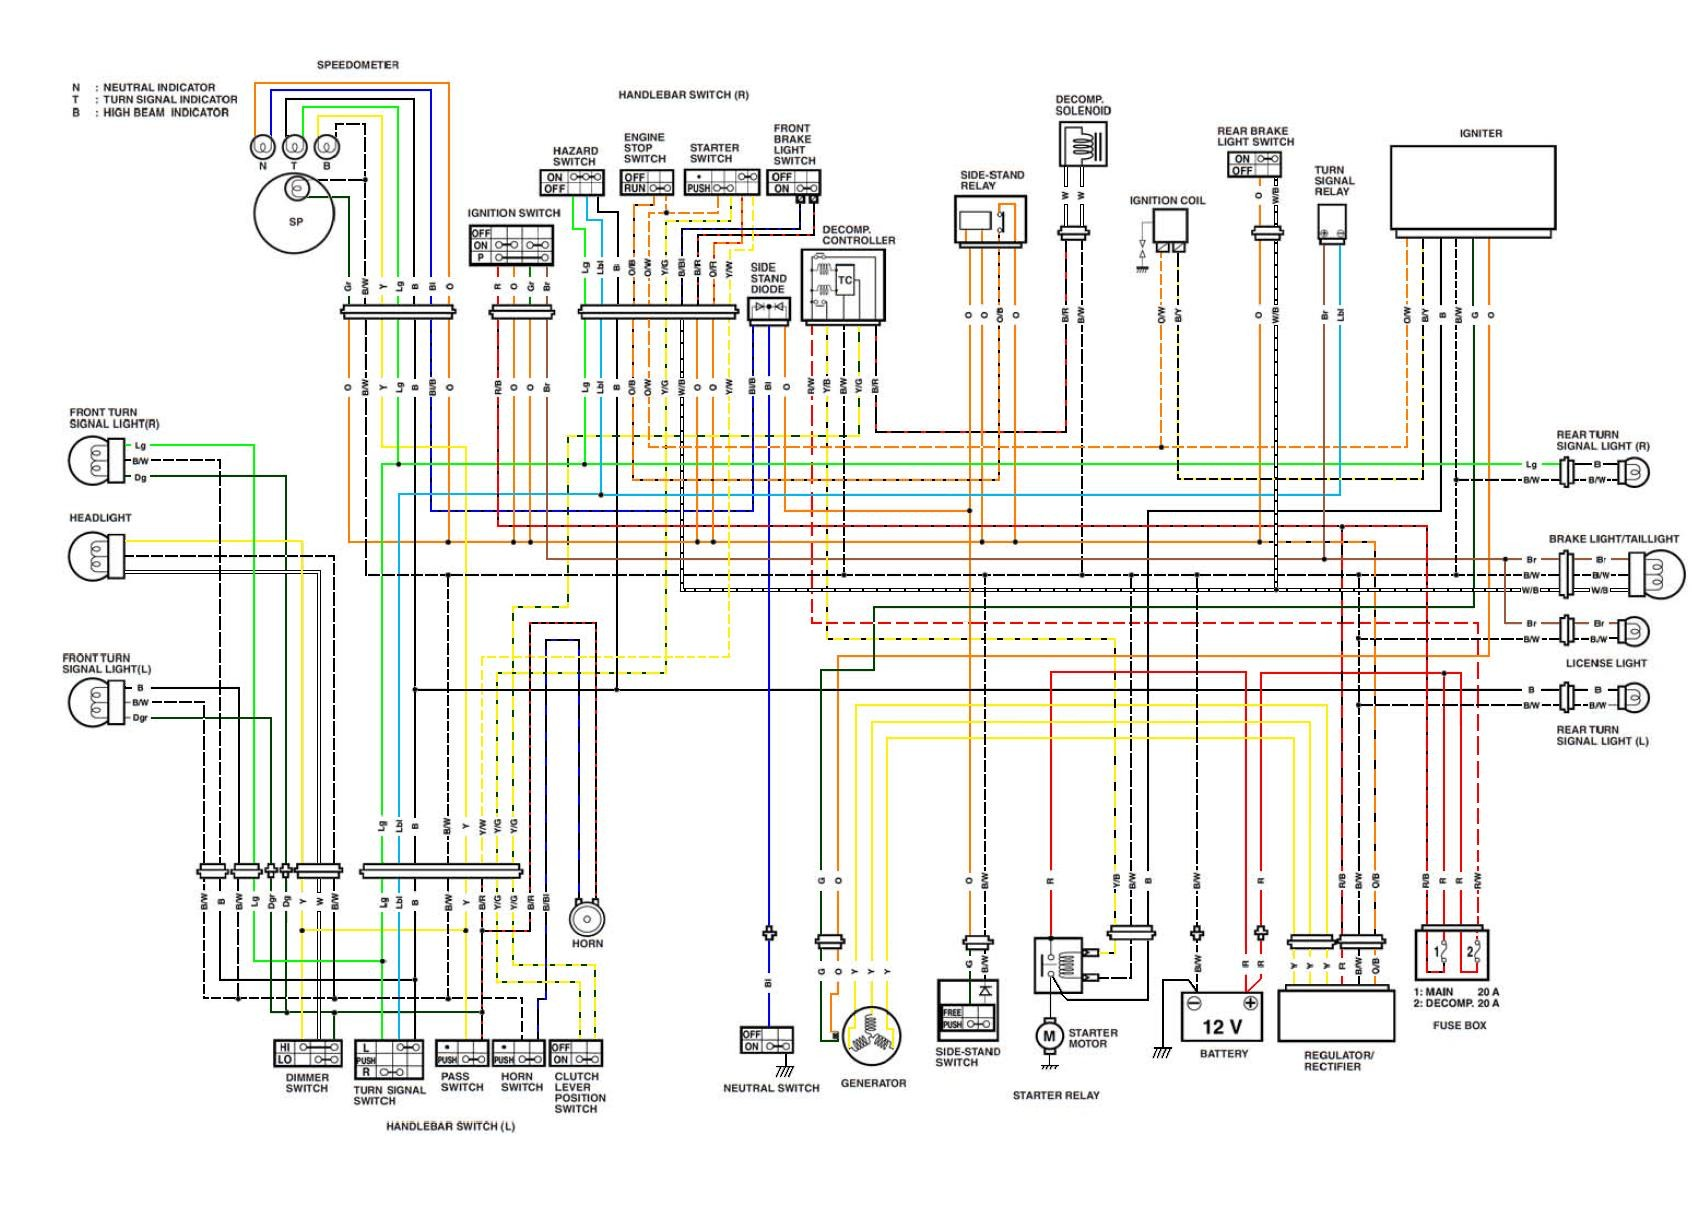 1990 Sportster Wiring Diagram 1998 sportster wiring diagram ... on flhtk wiring diagram, flh wiring diagram, classic wiring diagram, fxstd wiring diagram, honda wiring diagram, ultra wiring diagram, wl wiring diagram, kawasaki wiring diagram, flstf wiring diagram, harley wiring diagram, xlch wiring diagram, softail wiring diagram, vrscf wiring diagram, rocker wiring diagram, flhtcu wiring diagram, fxstb wiring diagram, fld wiring diagram, fxstc wiring diagram, vrsc wiring diagram, dyna wiring diagram,